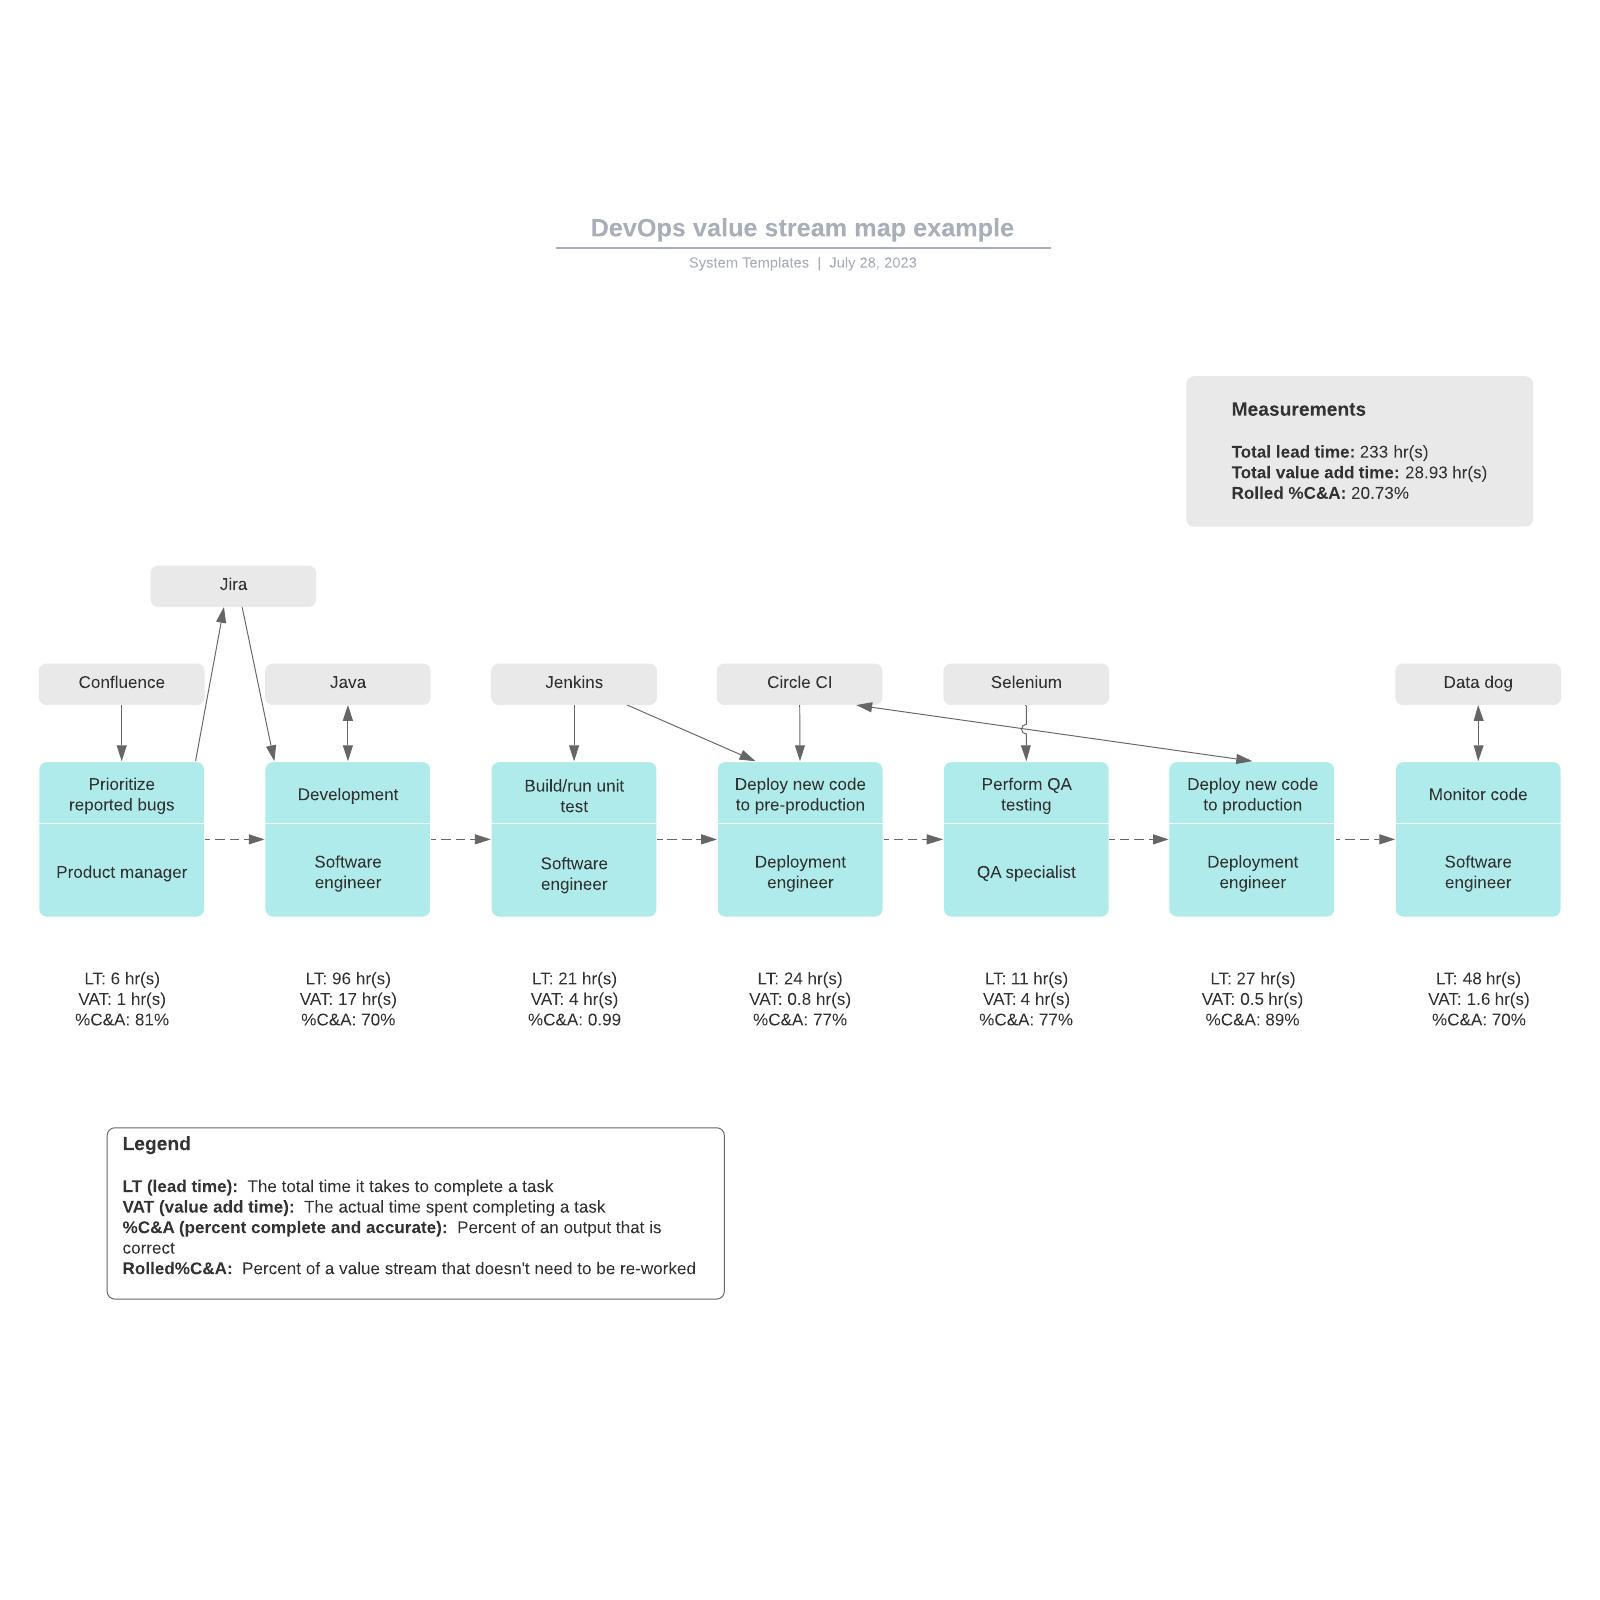 DevOps value stream map example